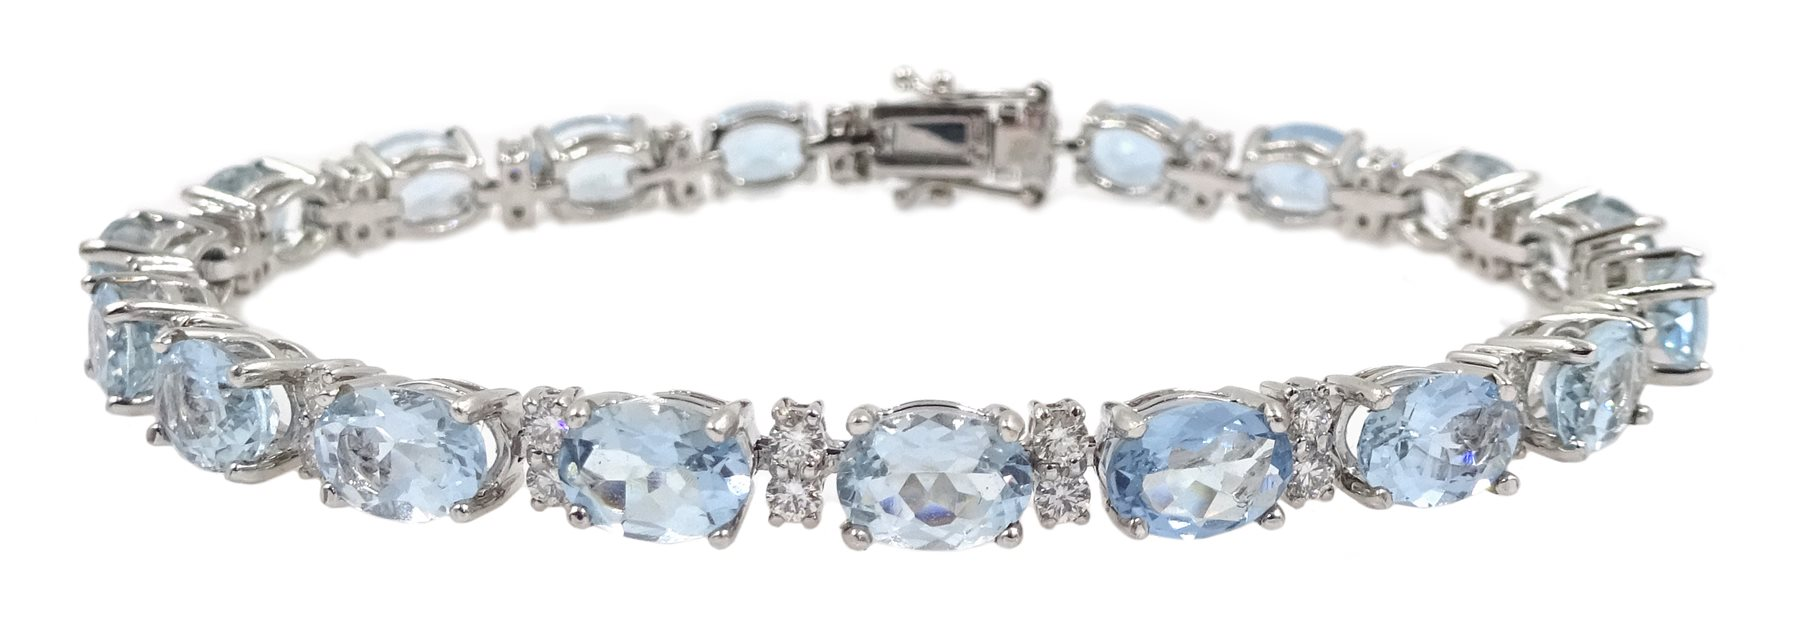 18ct white gold oval aquamarine and diamond bracelet